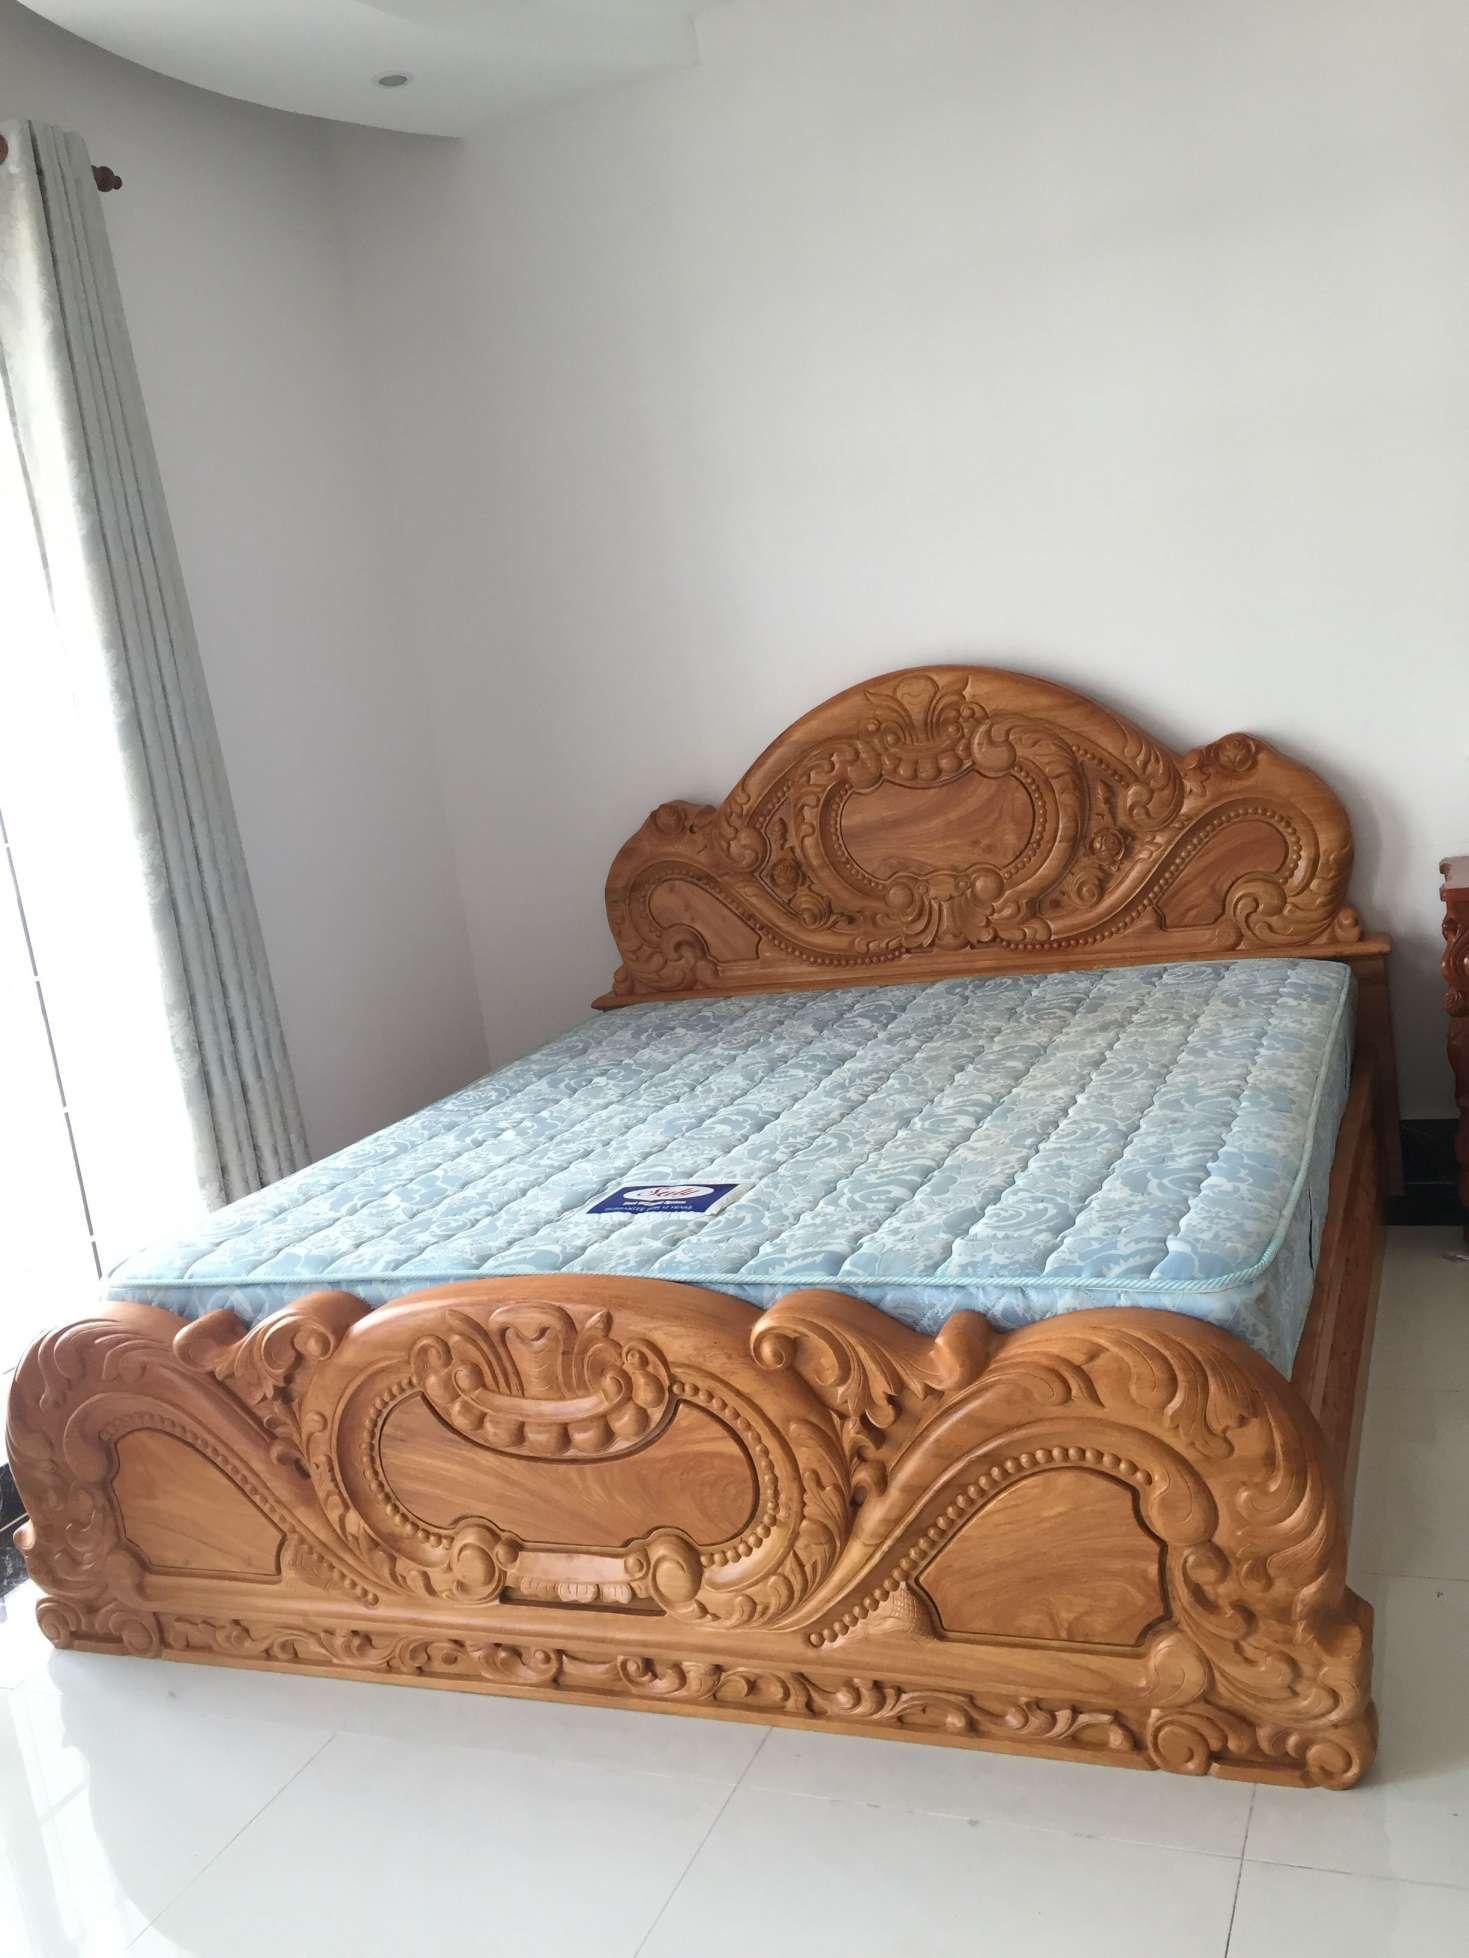 9 Splendid Wood Carving Furniture Bedroom Photos Wood Carving In 2020 Wood Bed Design Wooden Bed Design Solid Wood Bed